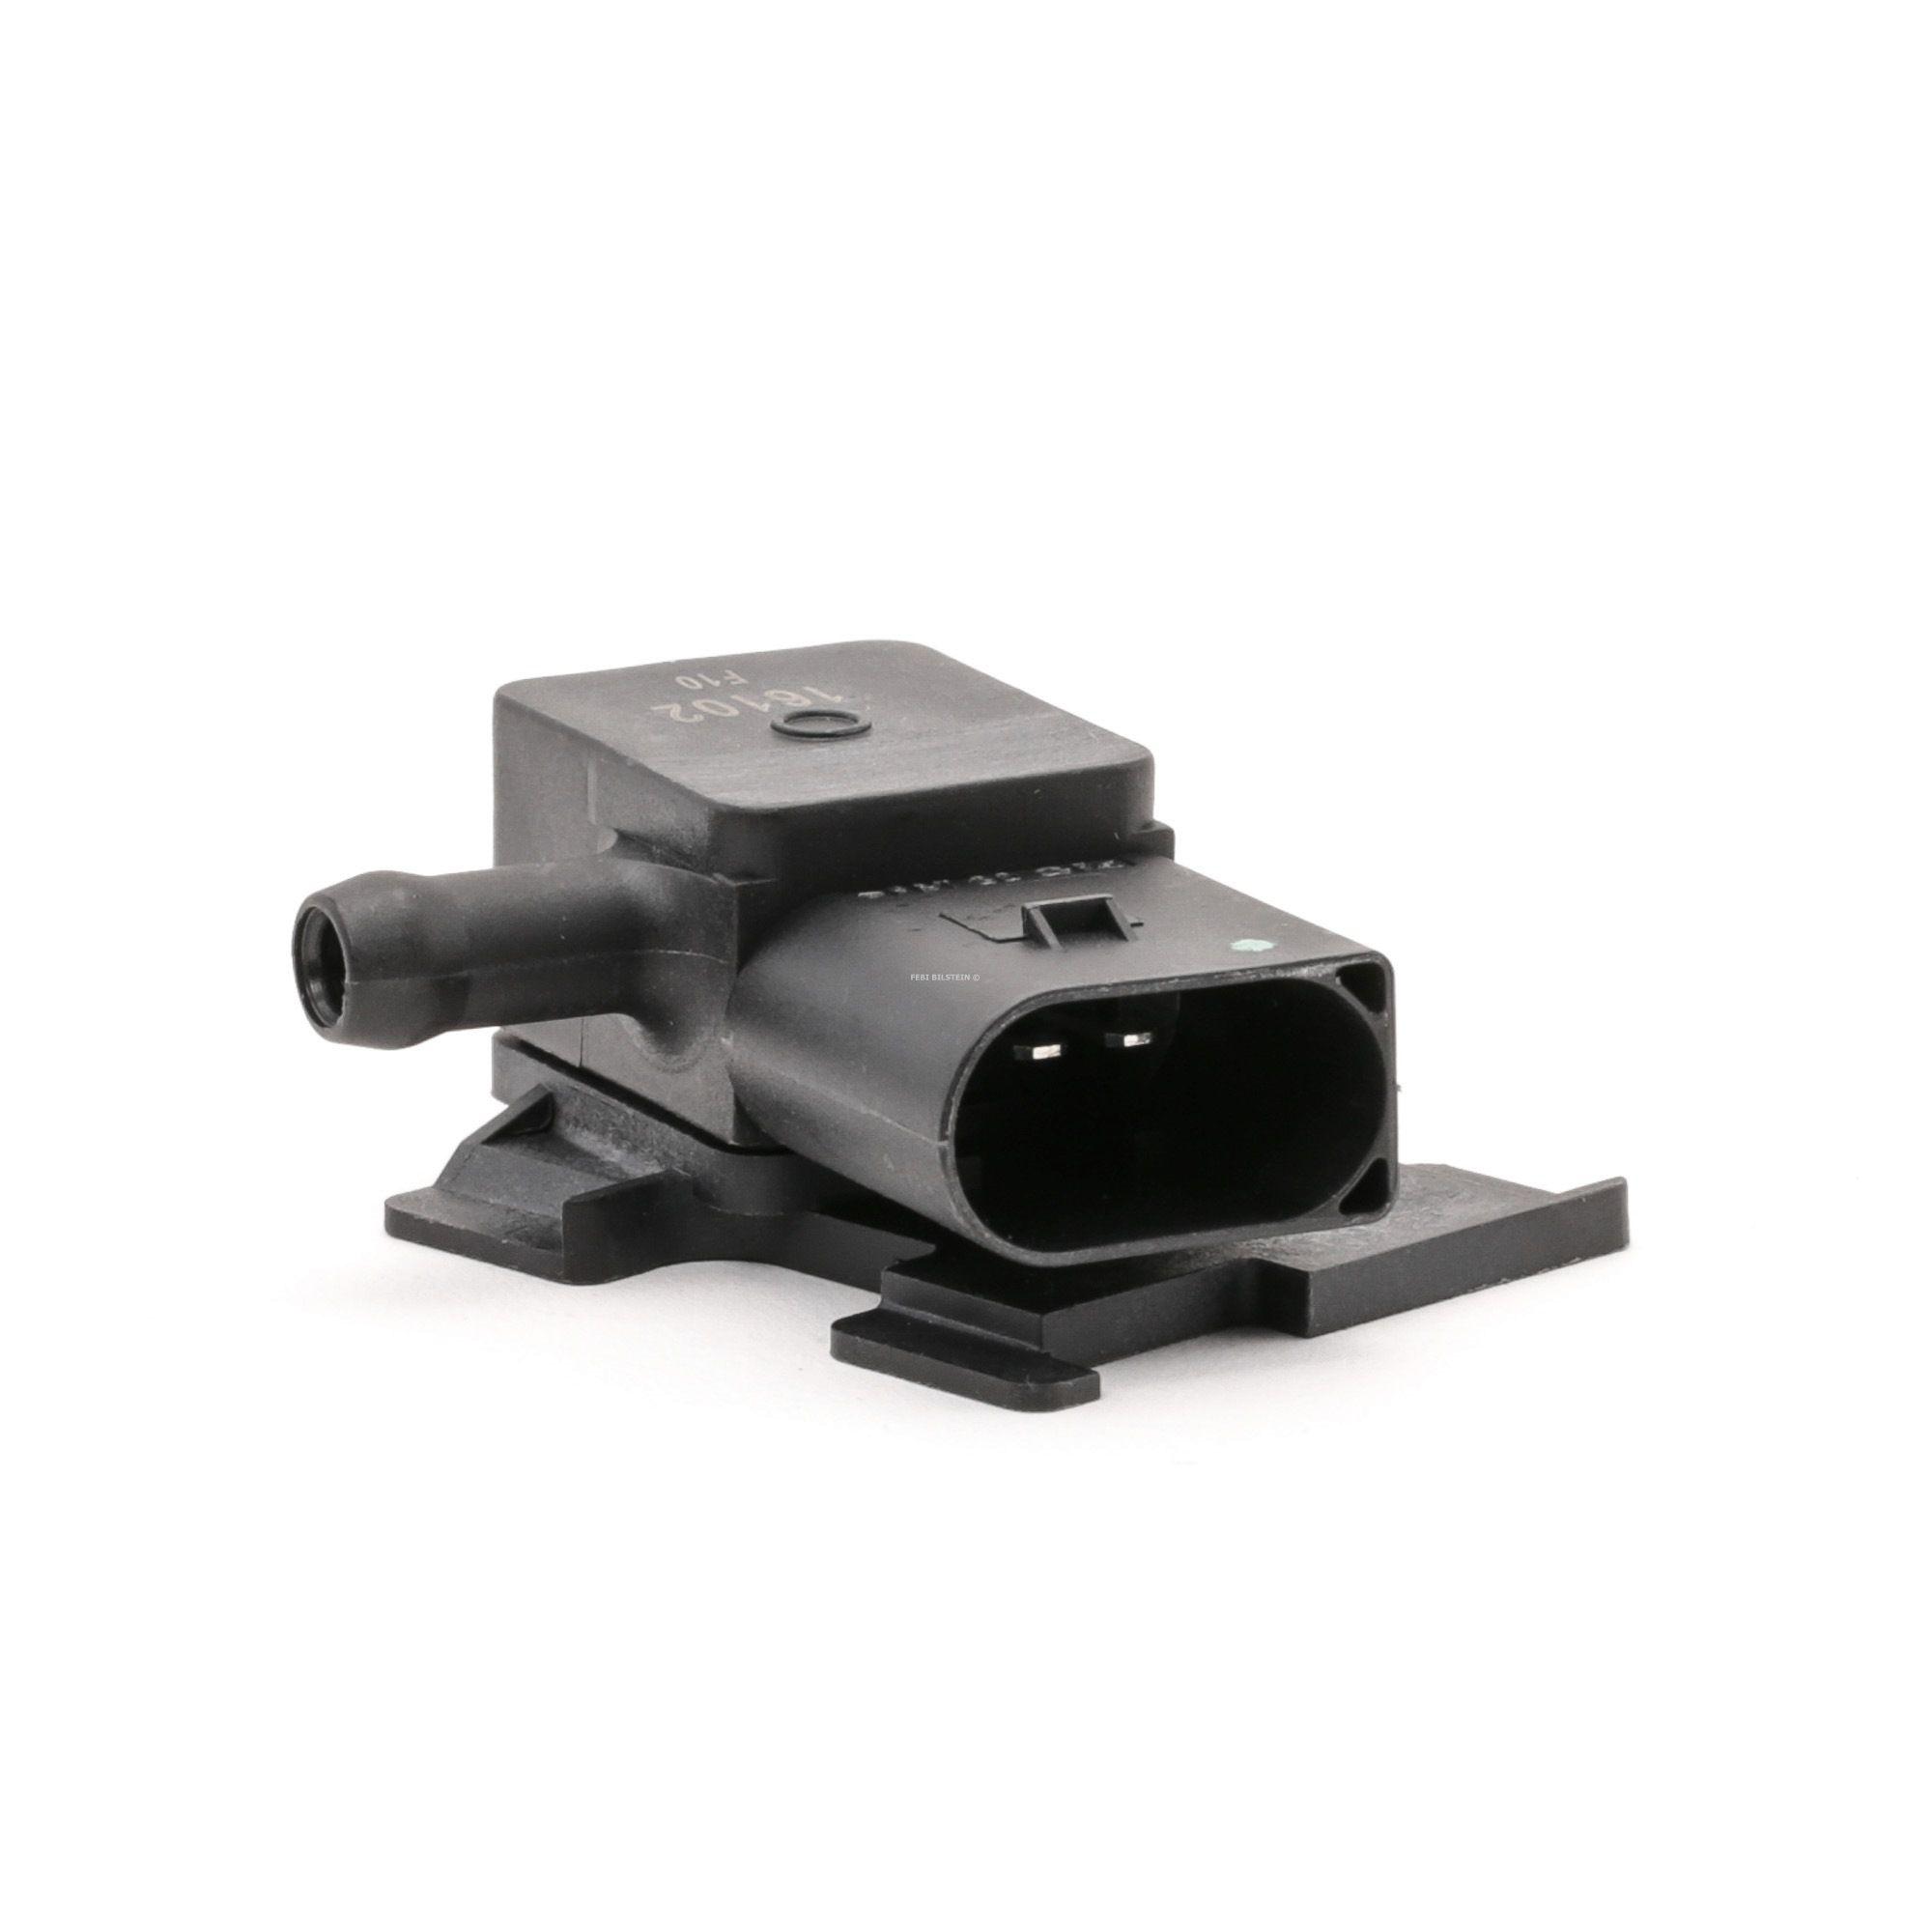 Original RENAULT Abgasdrucksensor 47155